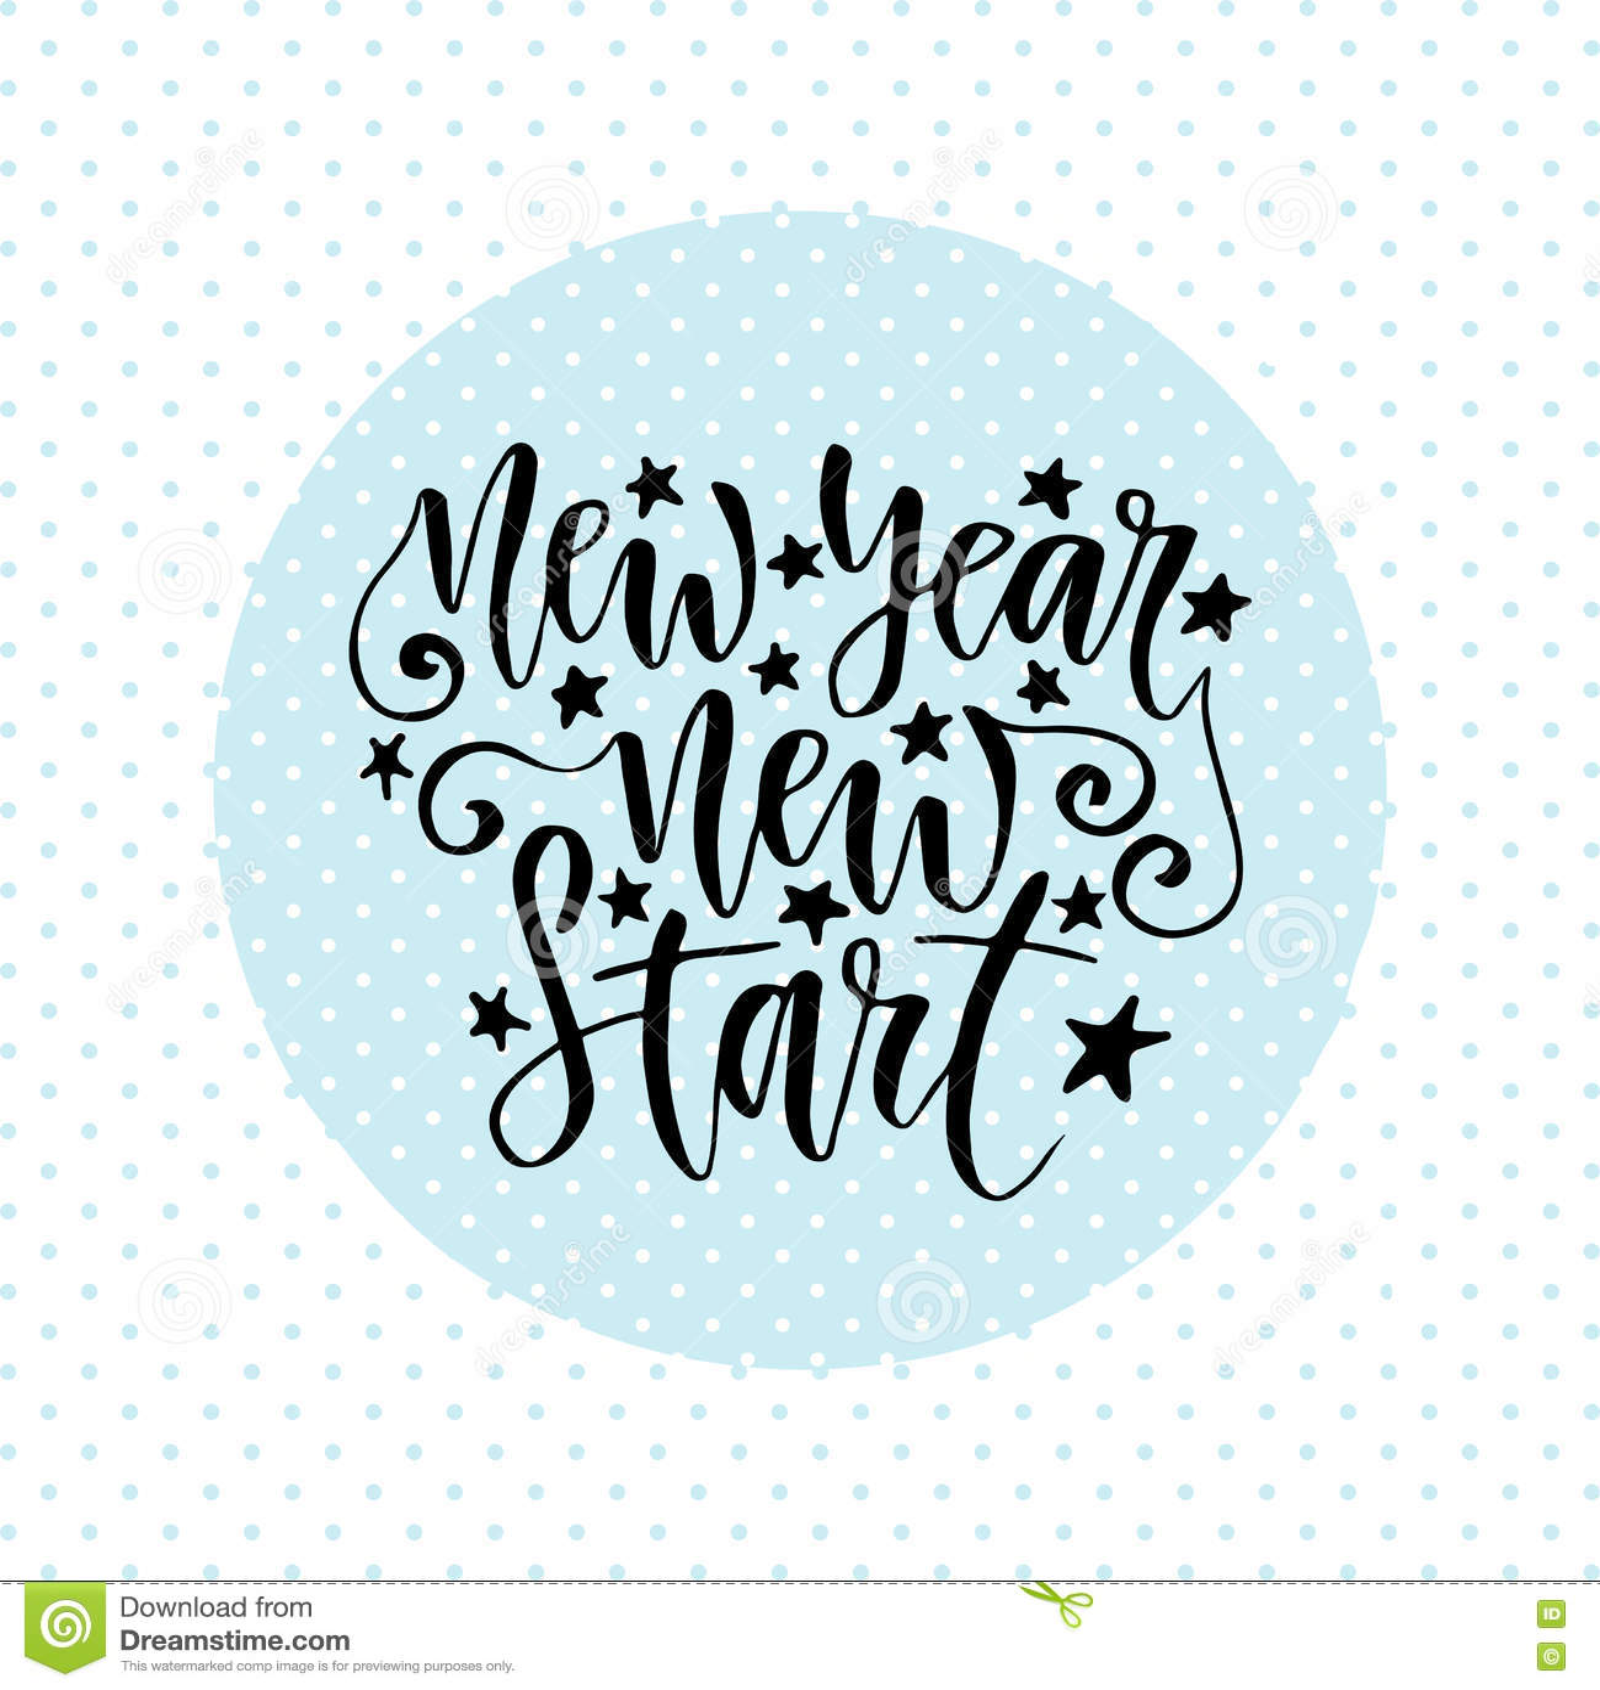 new year new start inspirational and motivational handwritten